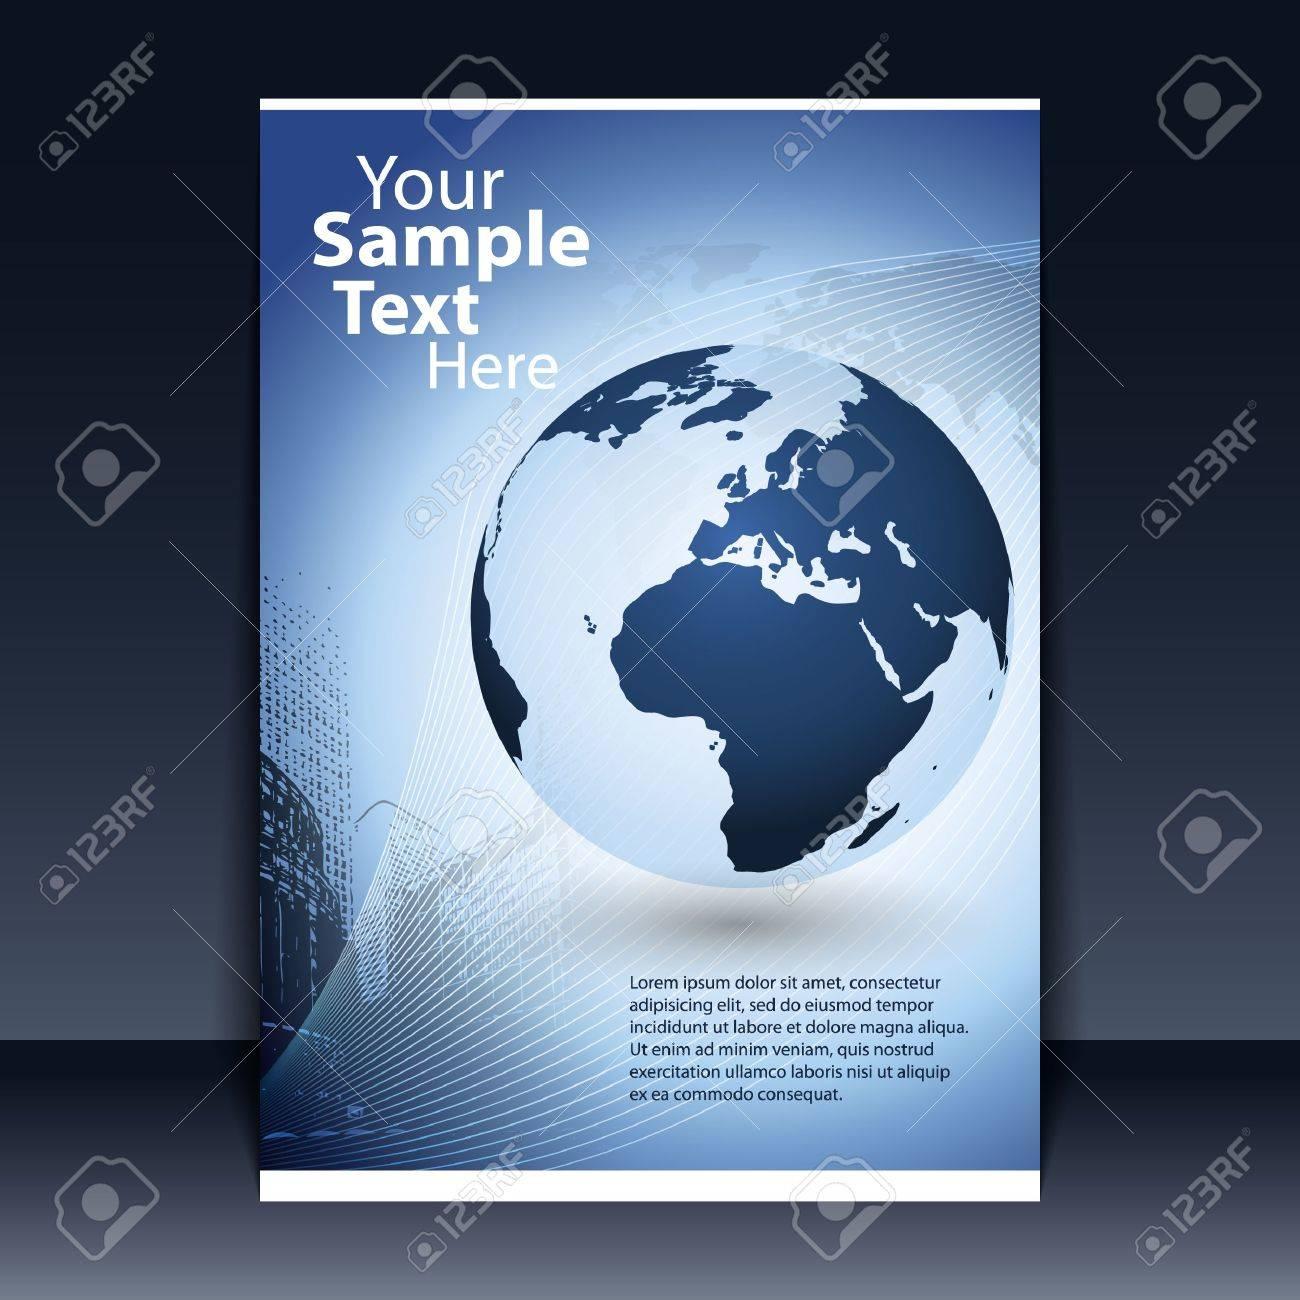 Flyer Design - Business Stock Vector - 11713186